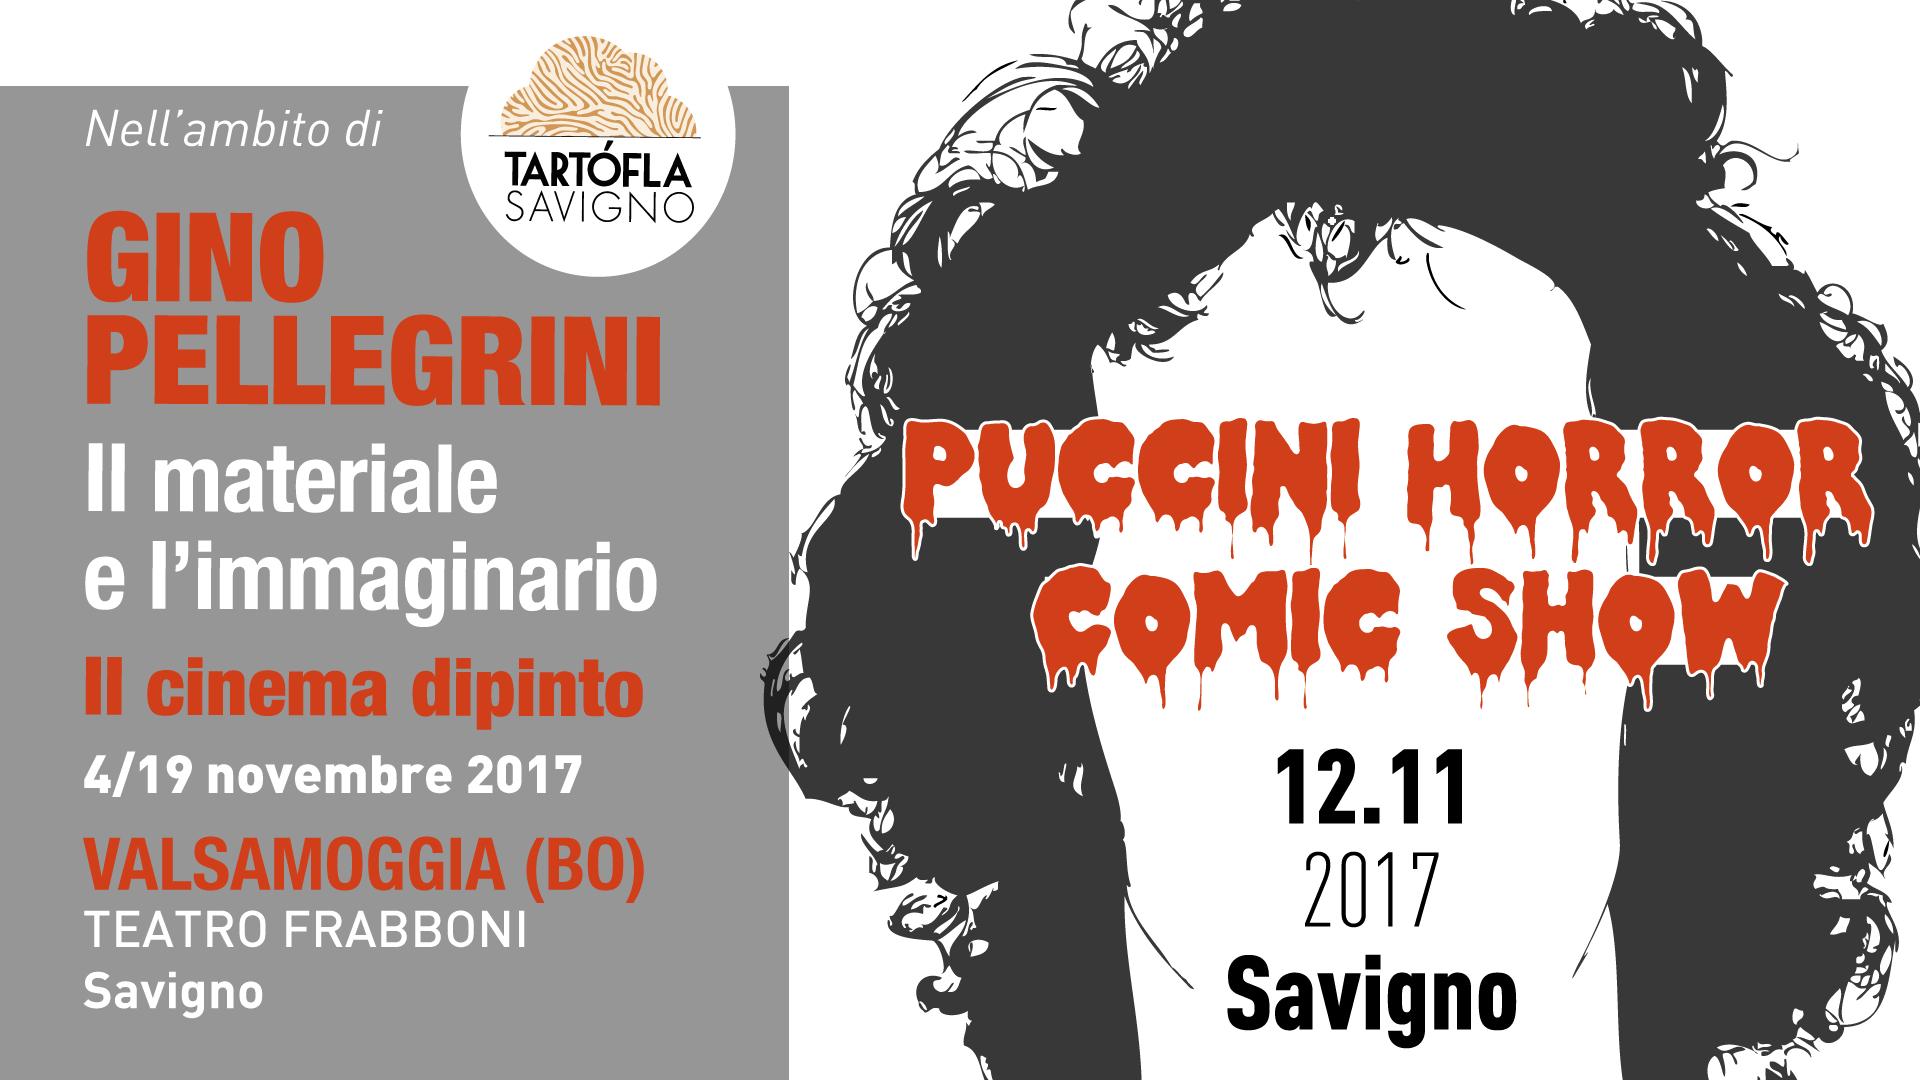 WP-Gino.P-Puccini-horror